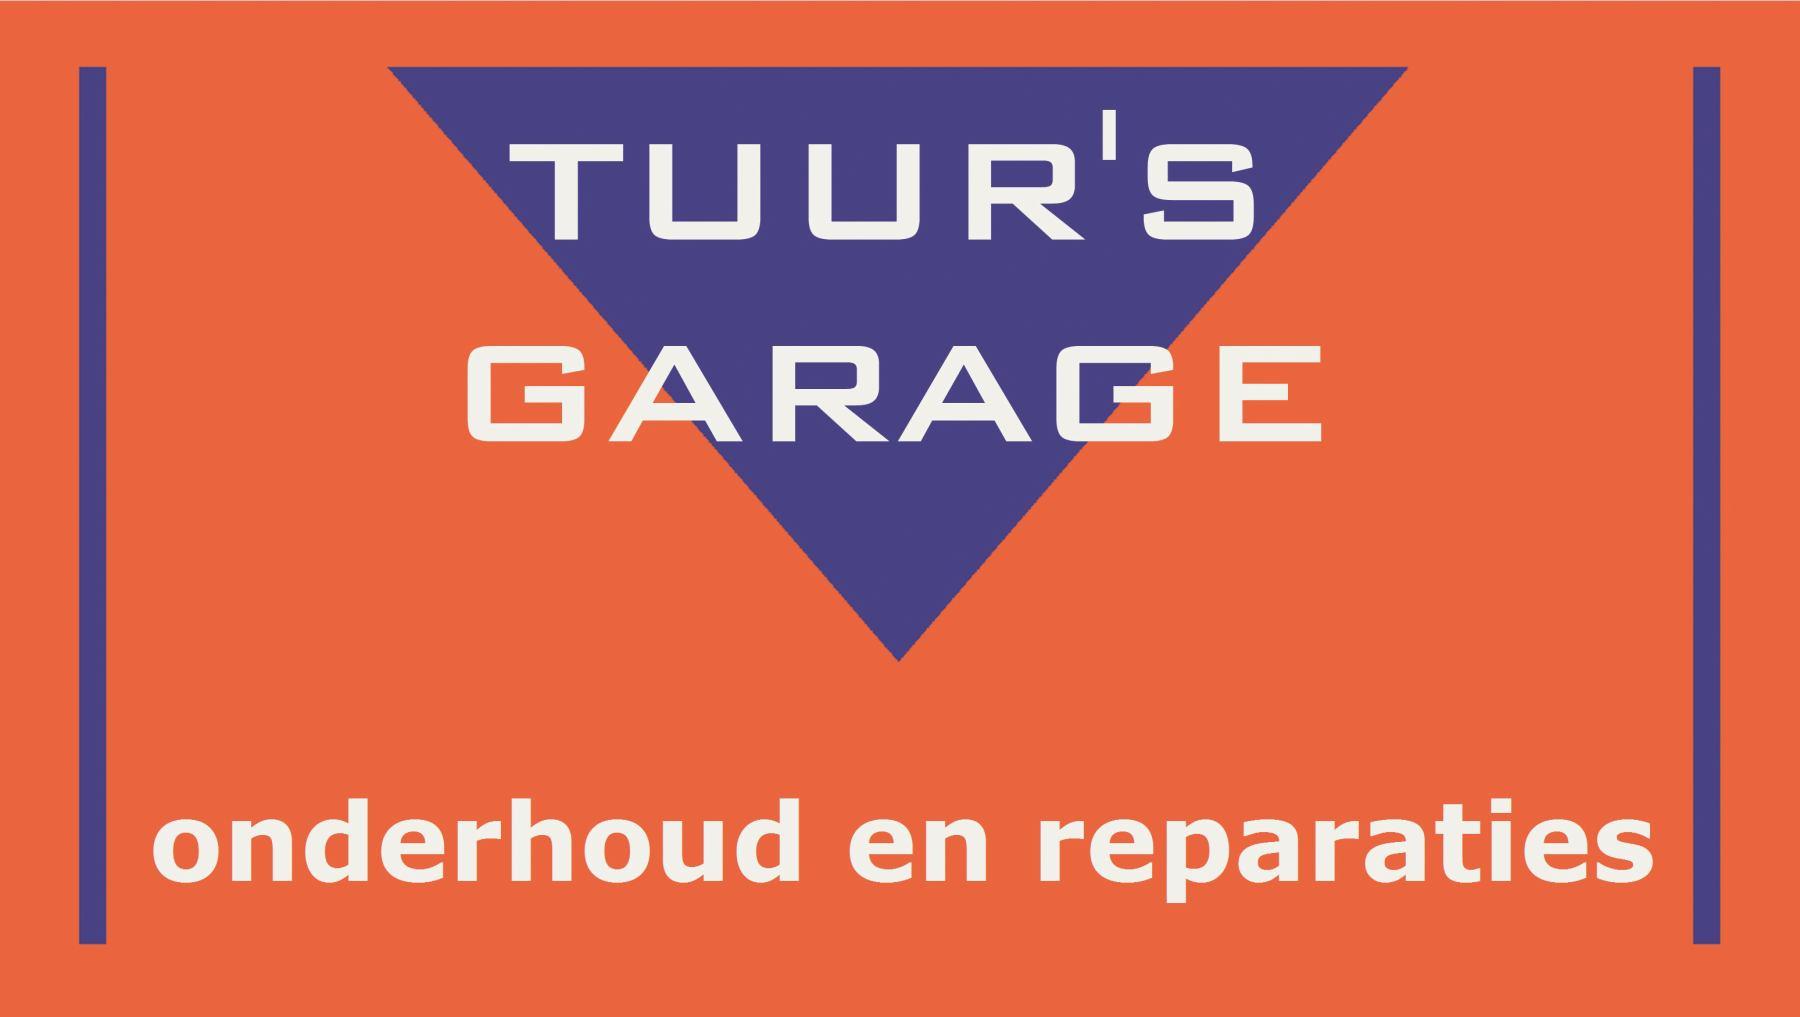 Tuur's Garage